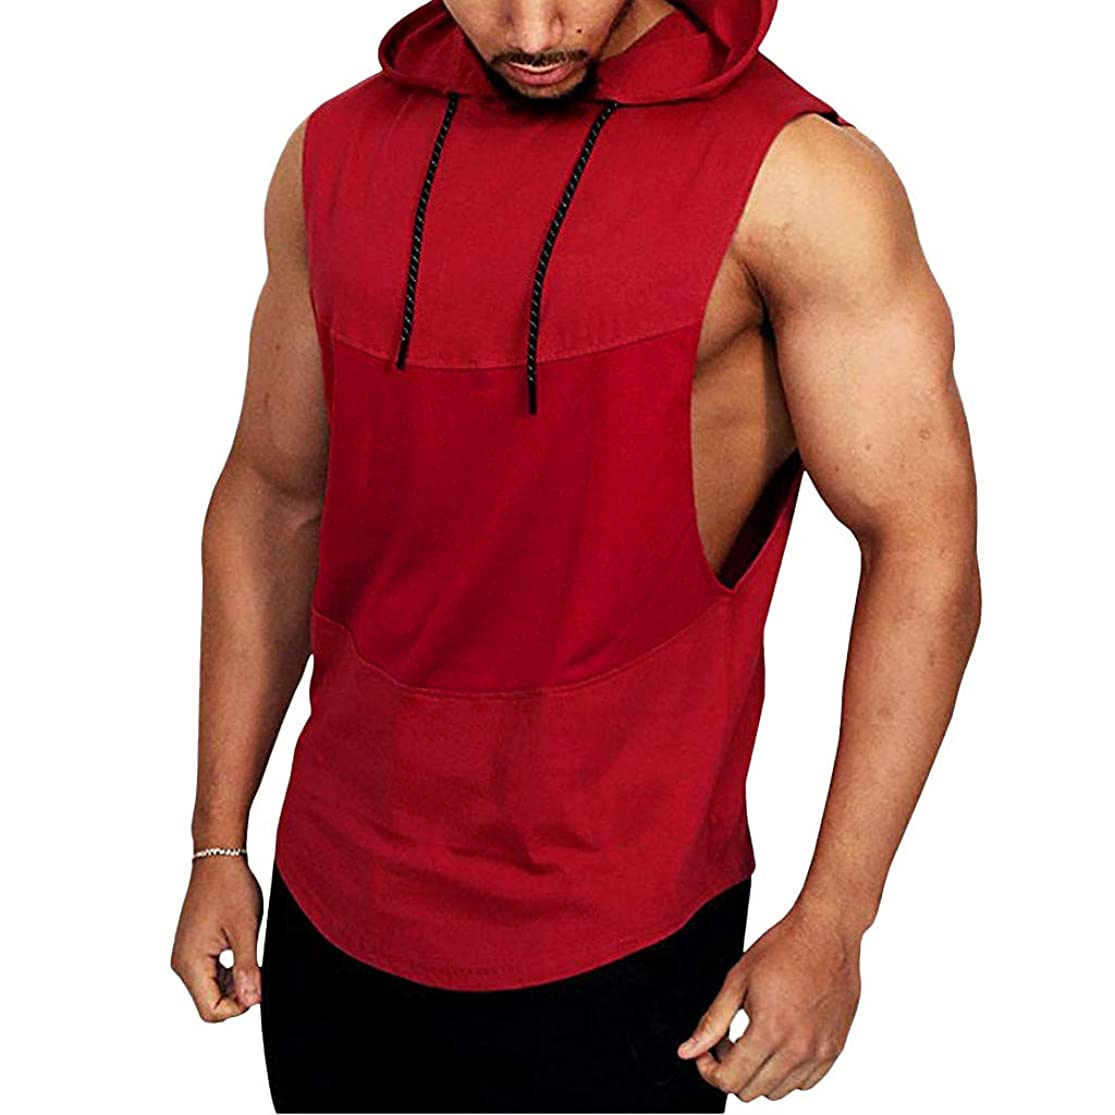 LISTHA Hoodie Vest Tank Men's Summer Casual Hooded Sleeveless Sport T-Shirt Tops stukzpzb5